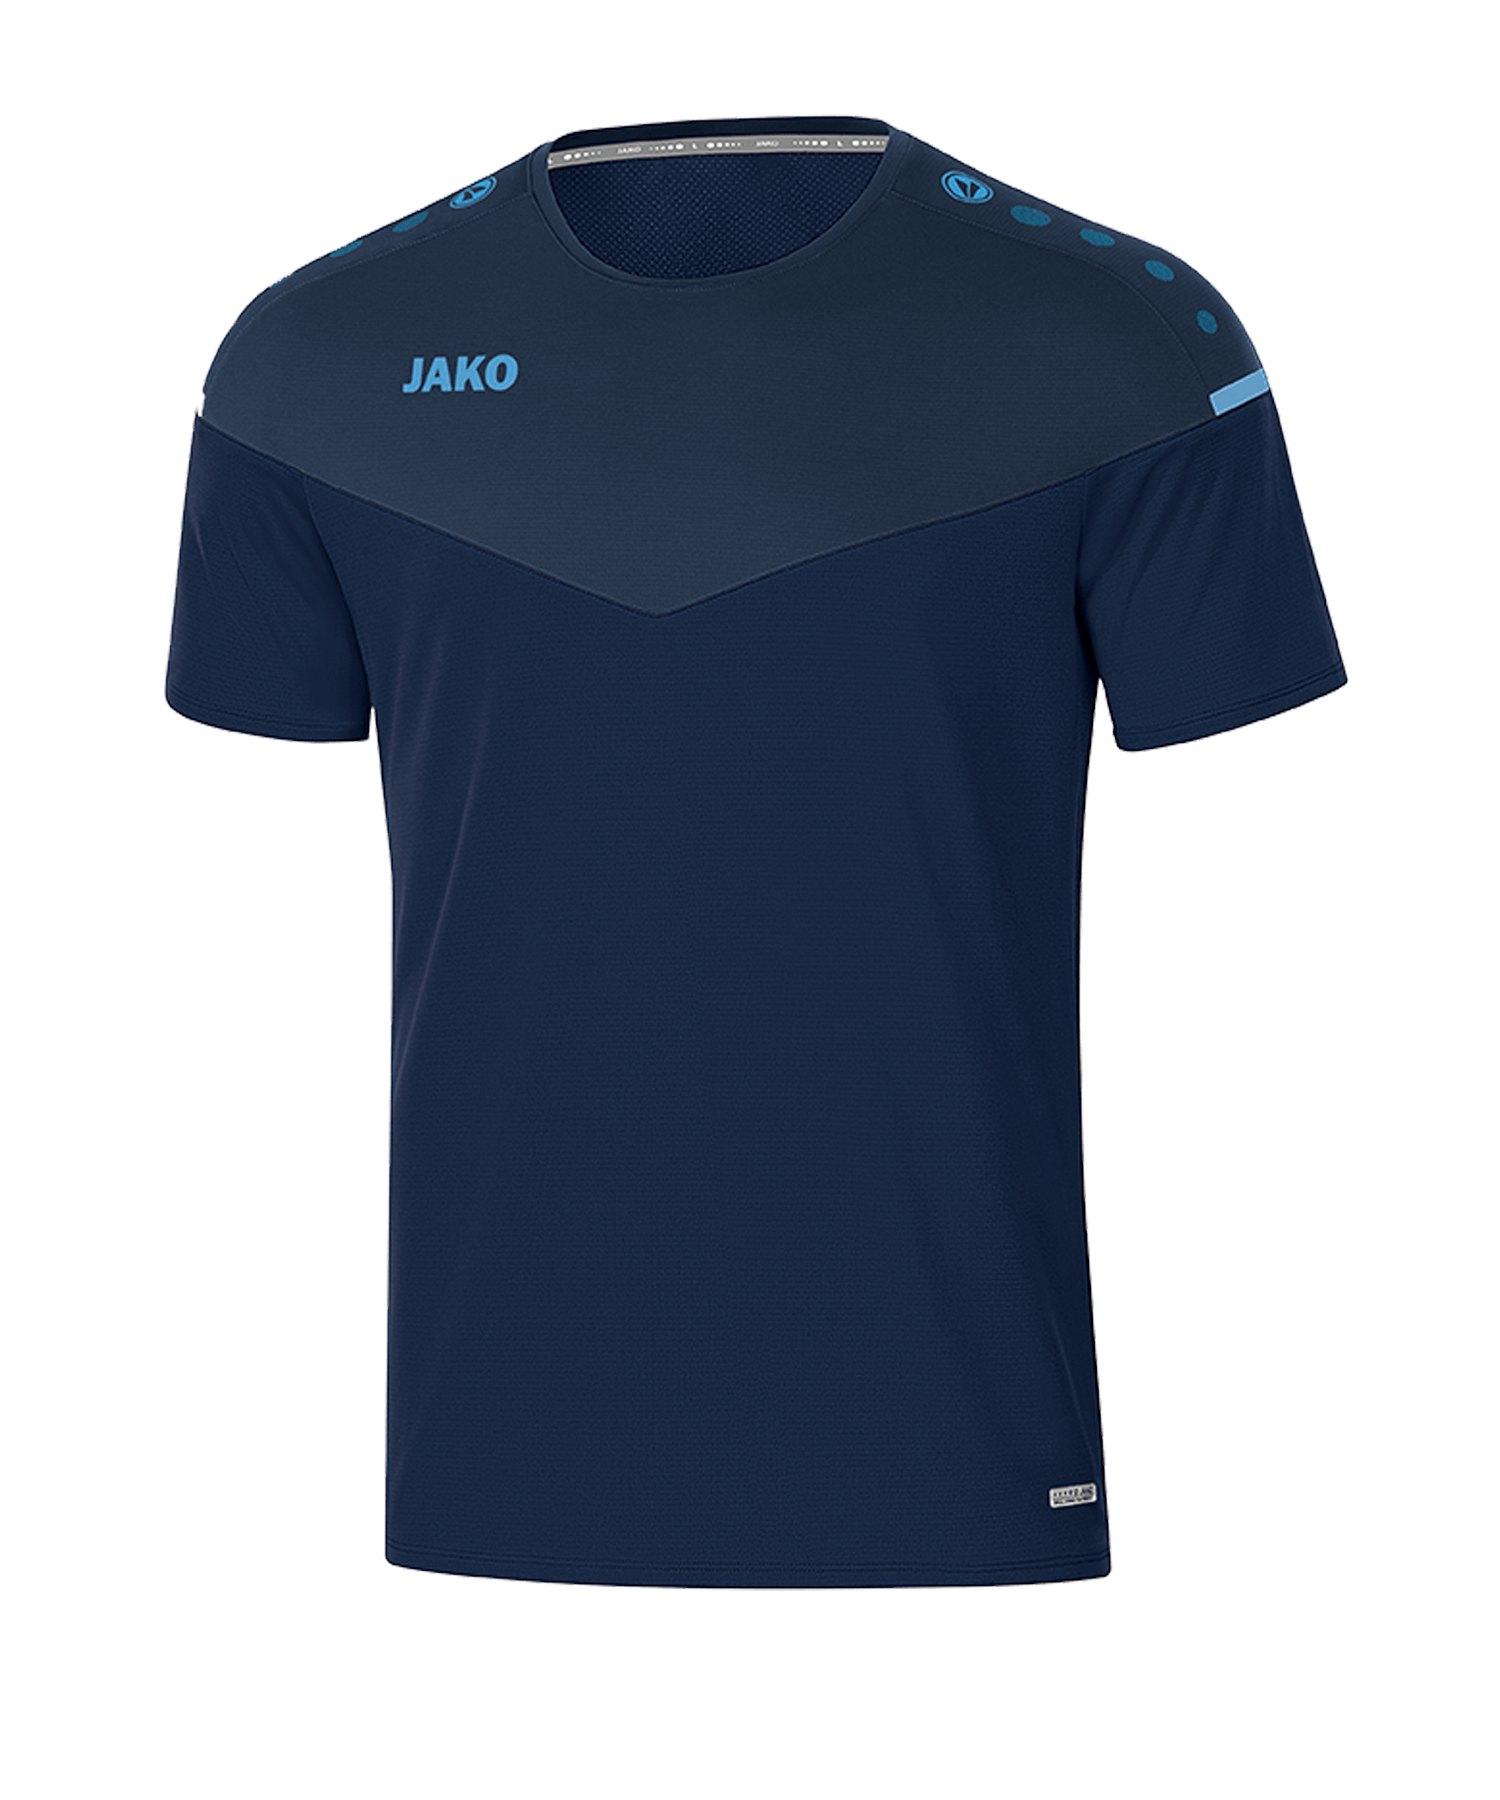 Jako Champ 2.0 T-Shirt Kids Blau F95 - blau